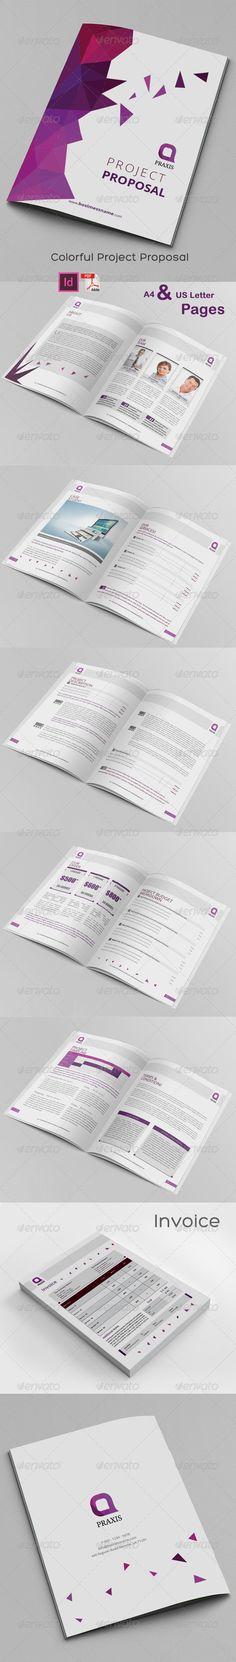 Project Proposal-1 Project proposal and Proposal templates - bid proposal templates